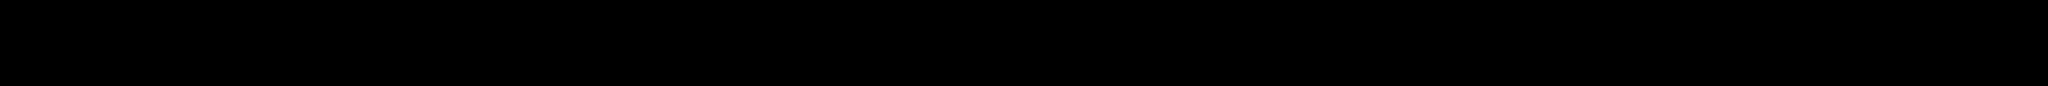 TOPRAN 1 091 709, 3133 1 091 709 Federbeinstützlager